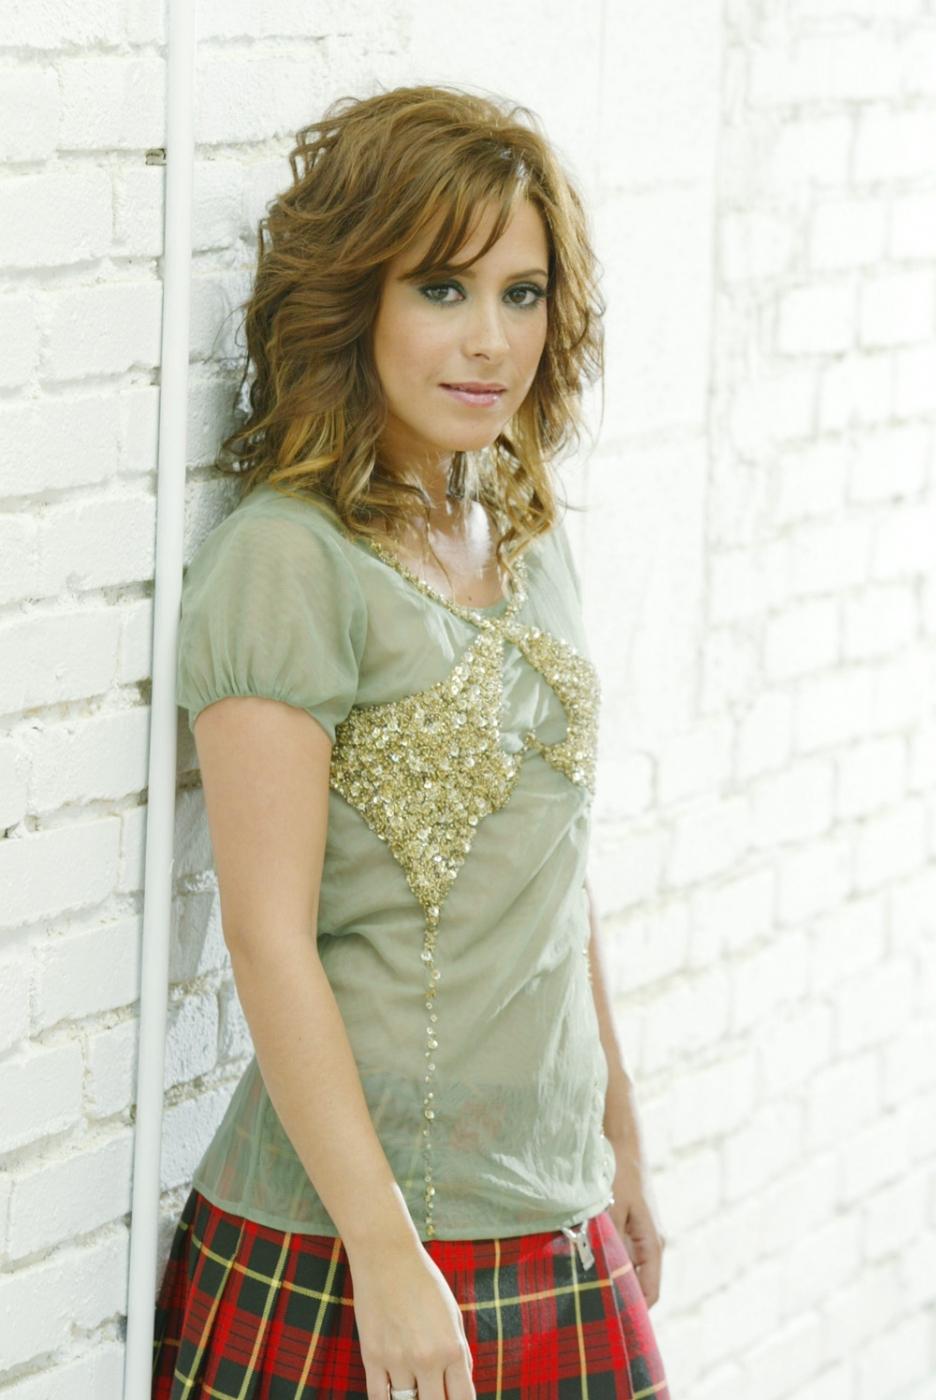 Kimberly Mccullough